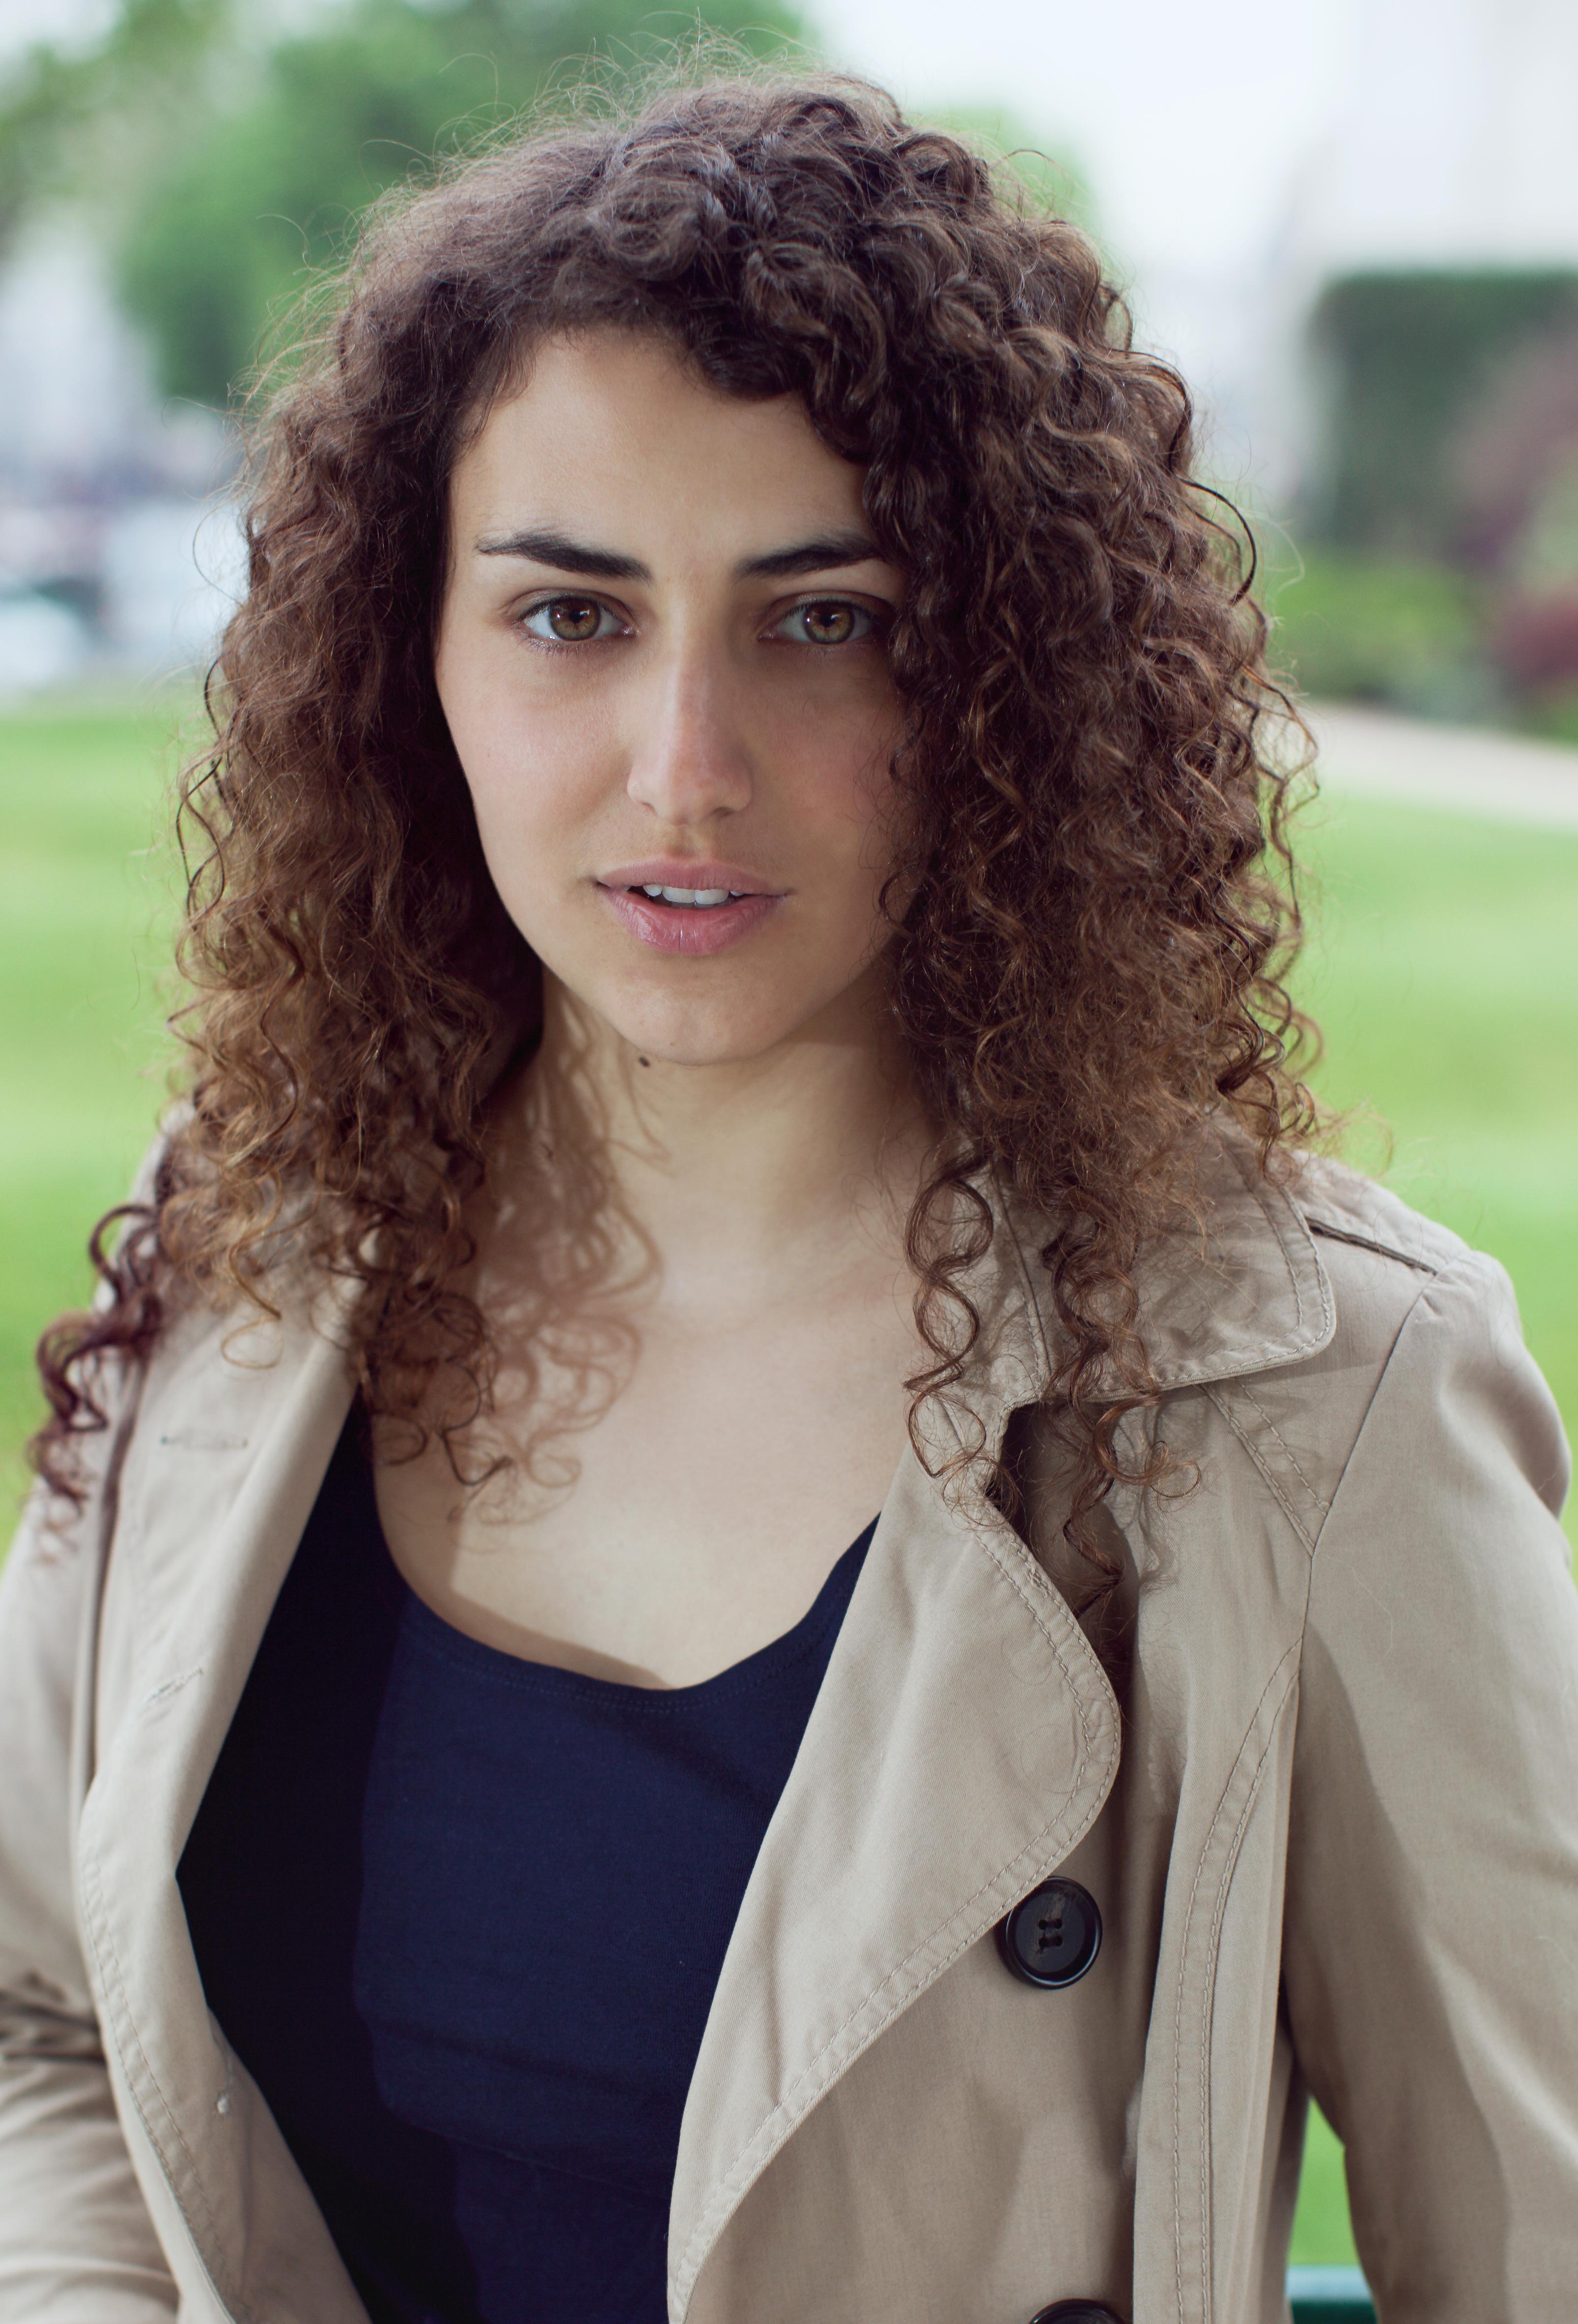 Sarah Glond